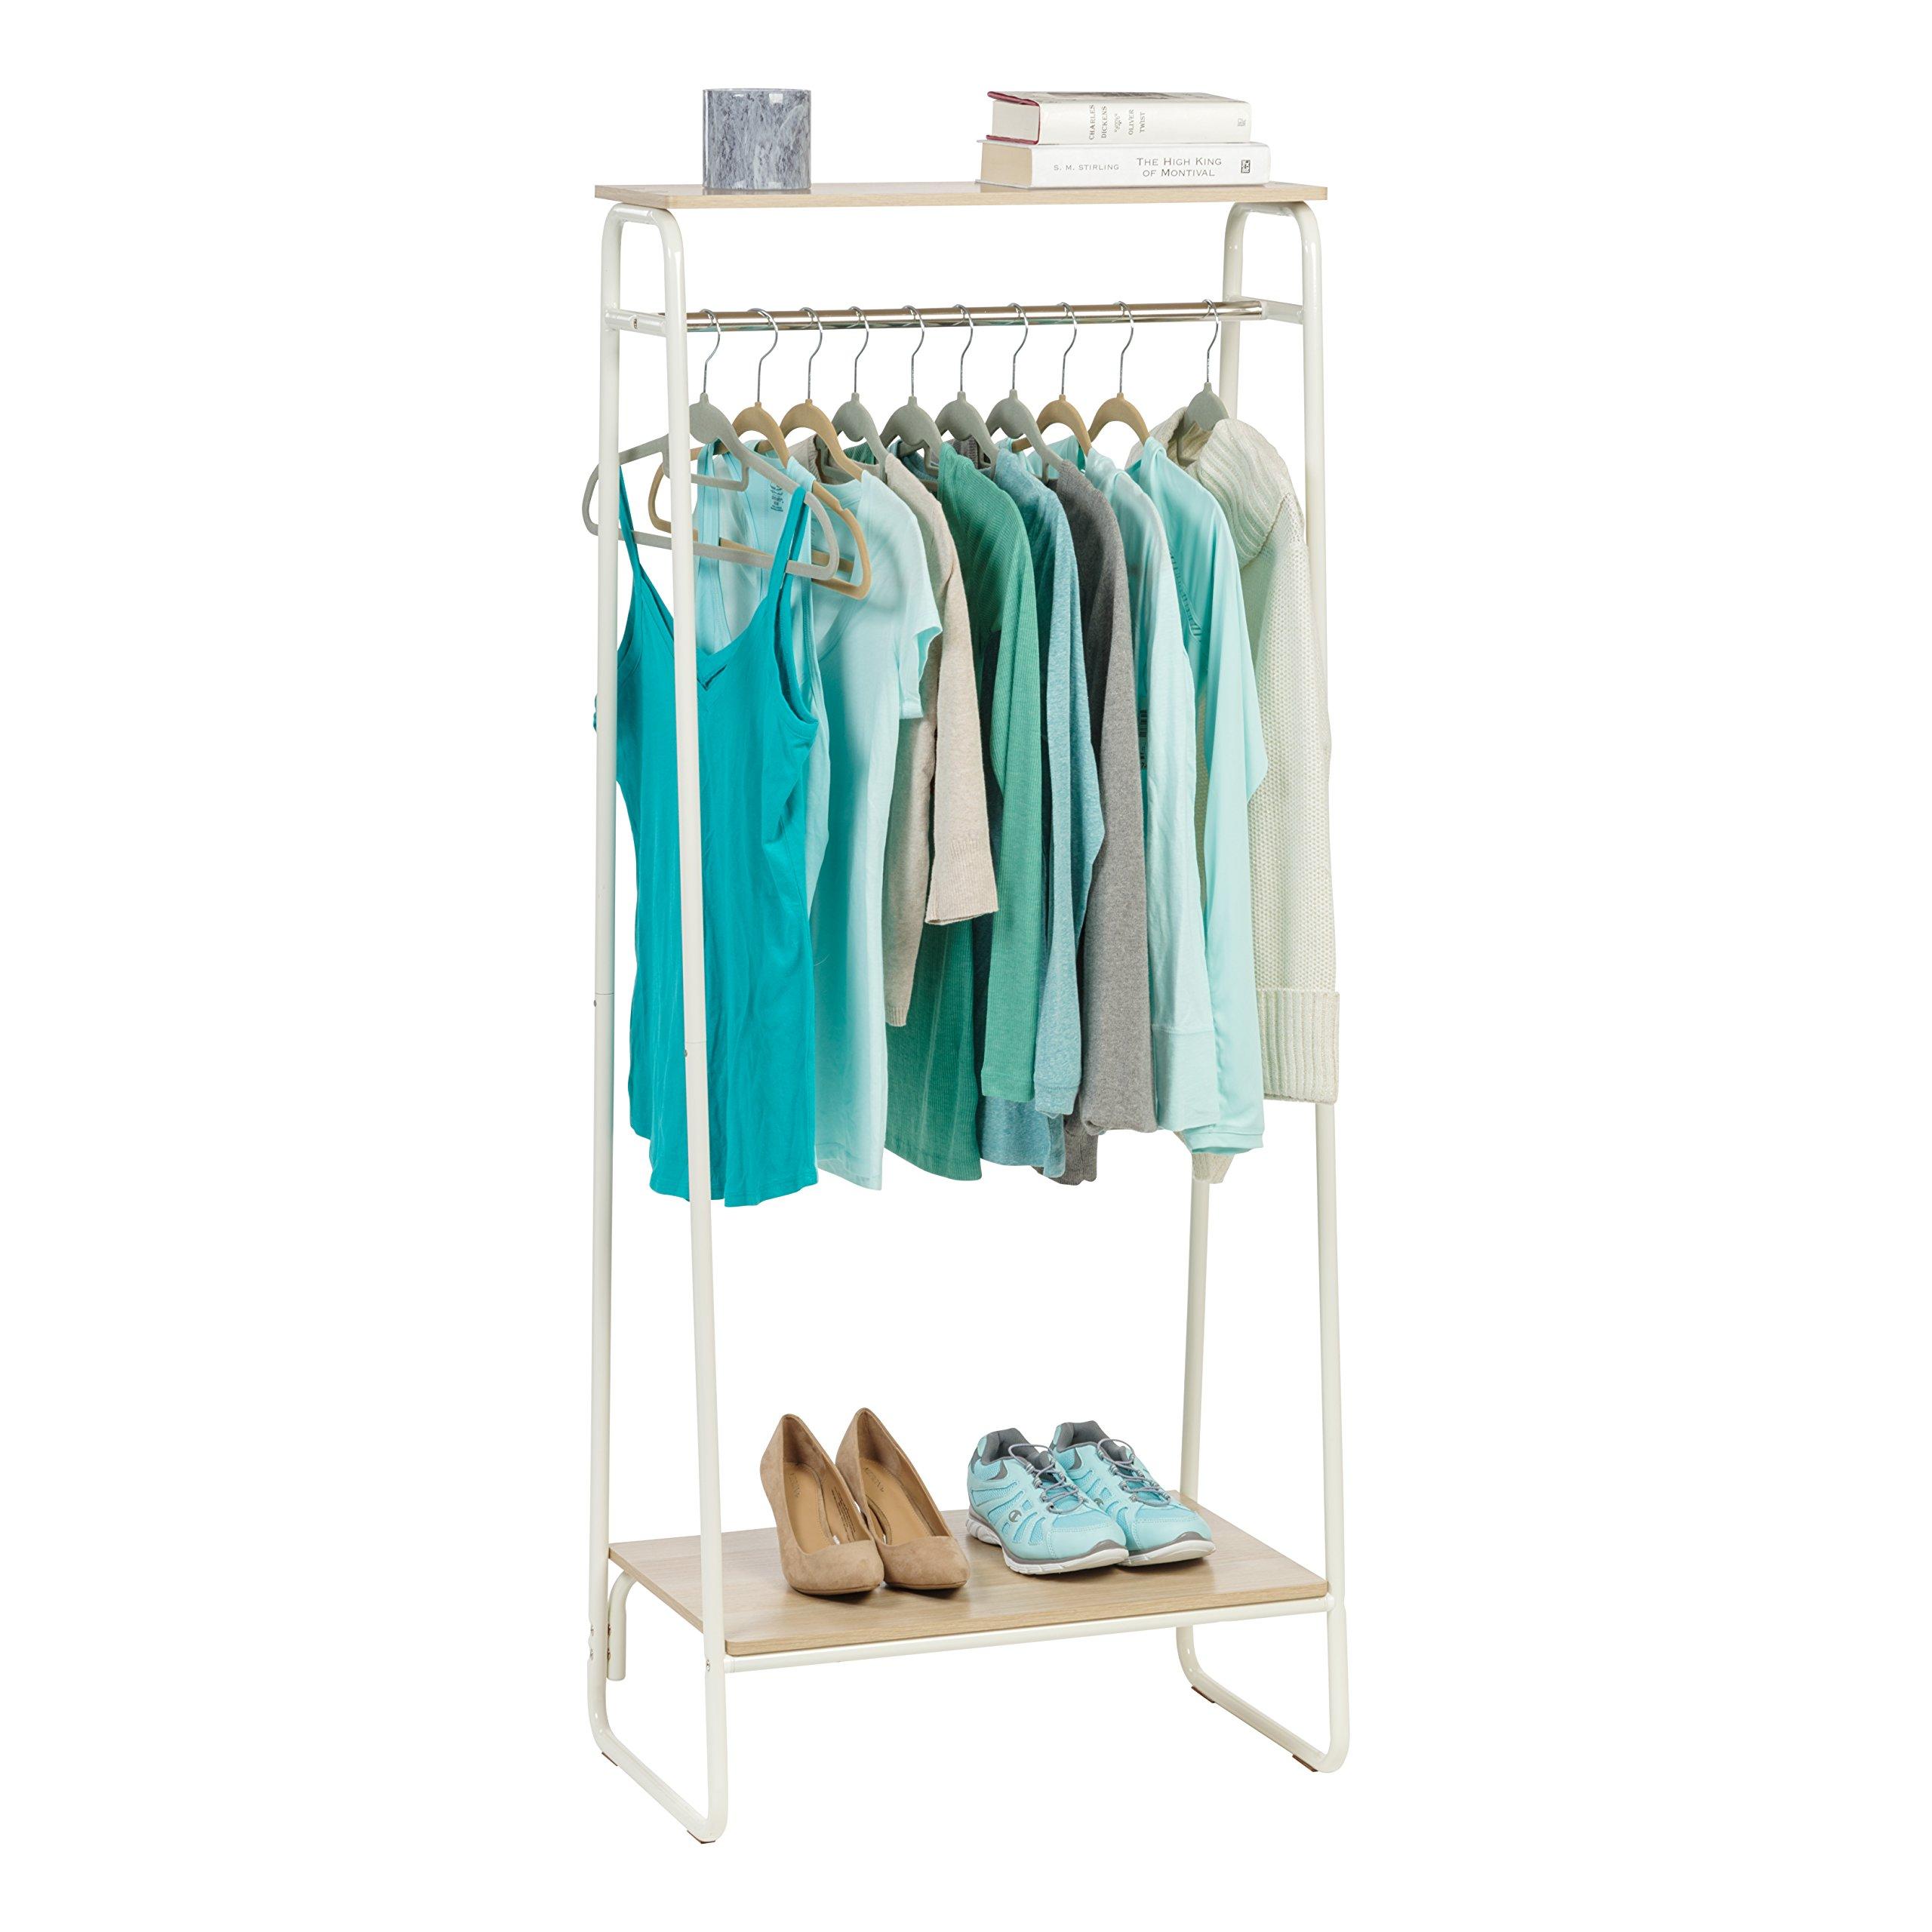 IRIS Metal Garment Rack with 2 Wood Shelves, White and Light Brown by IRIS USA, Inc. (Image #7)